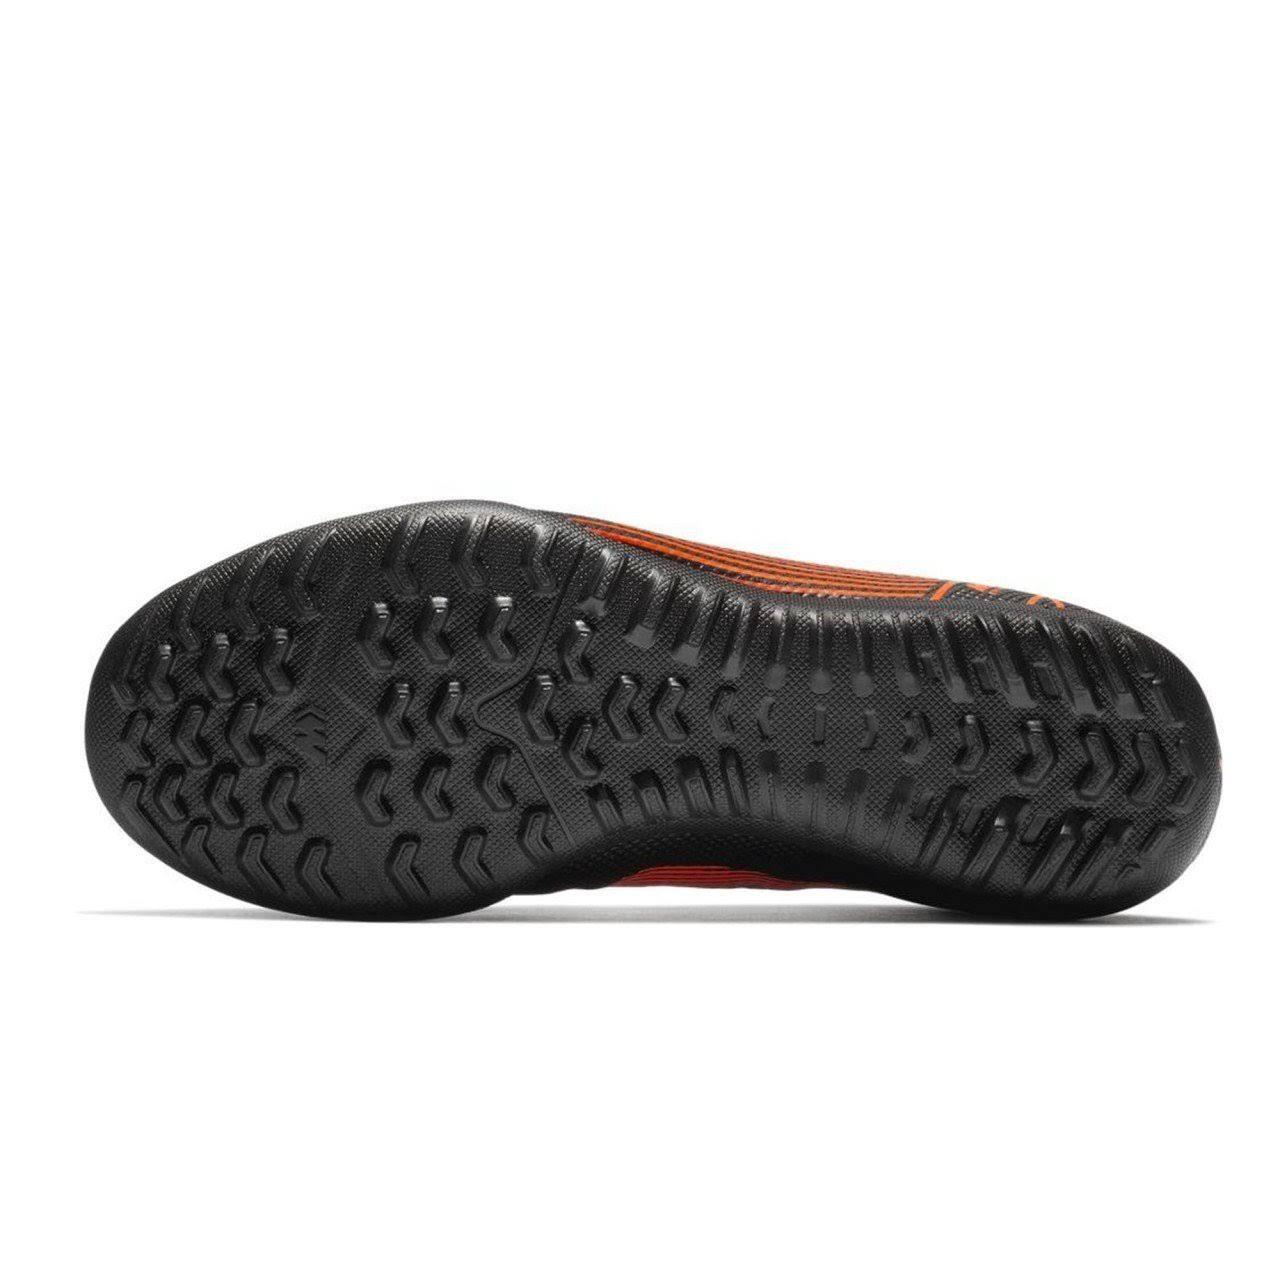 Vi Küçük Saha Kramponu Çocuk Halı Club Tf Nike Jr genç Siyah Superfly Mercurial q6TtU